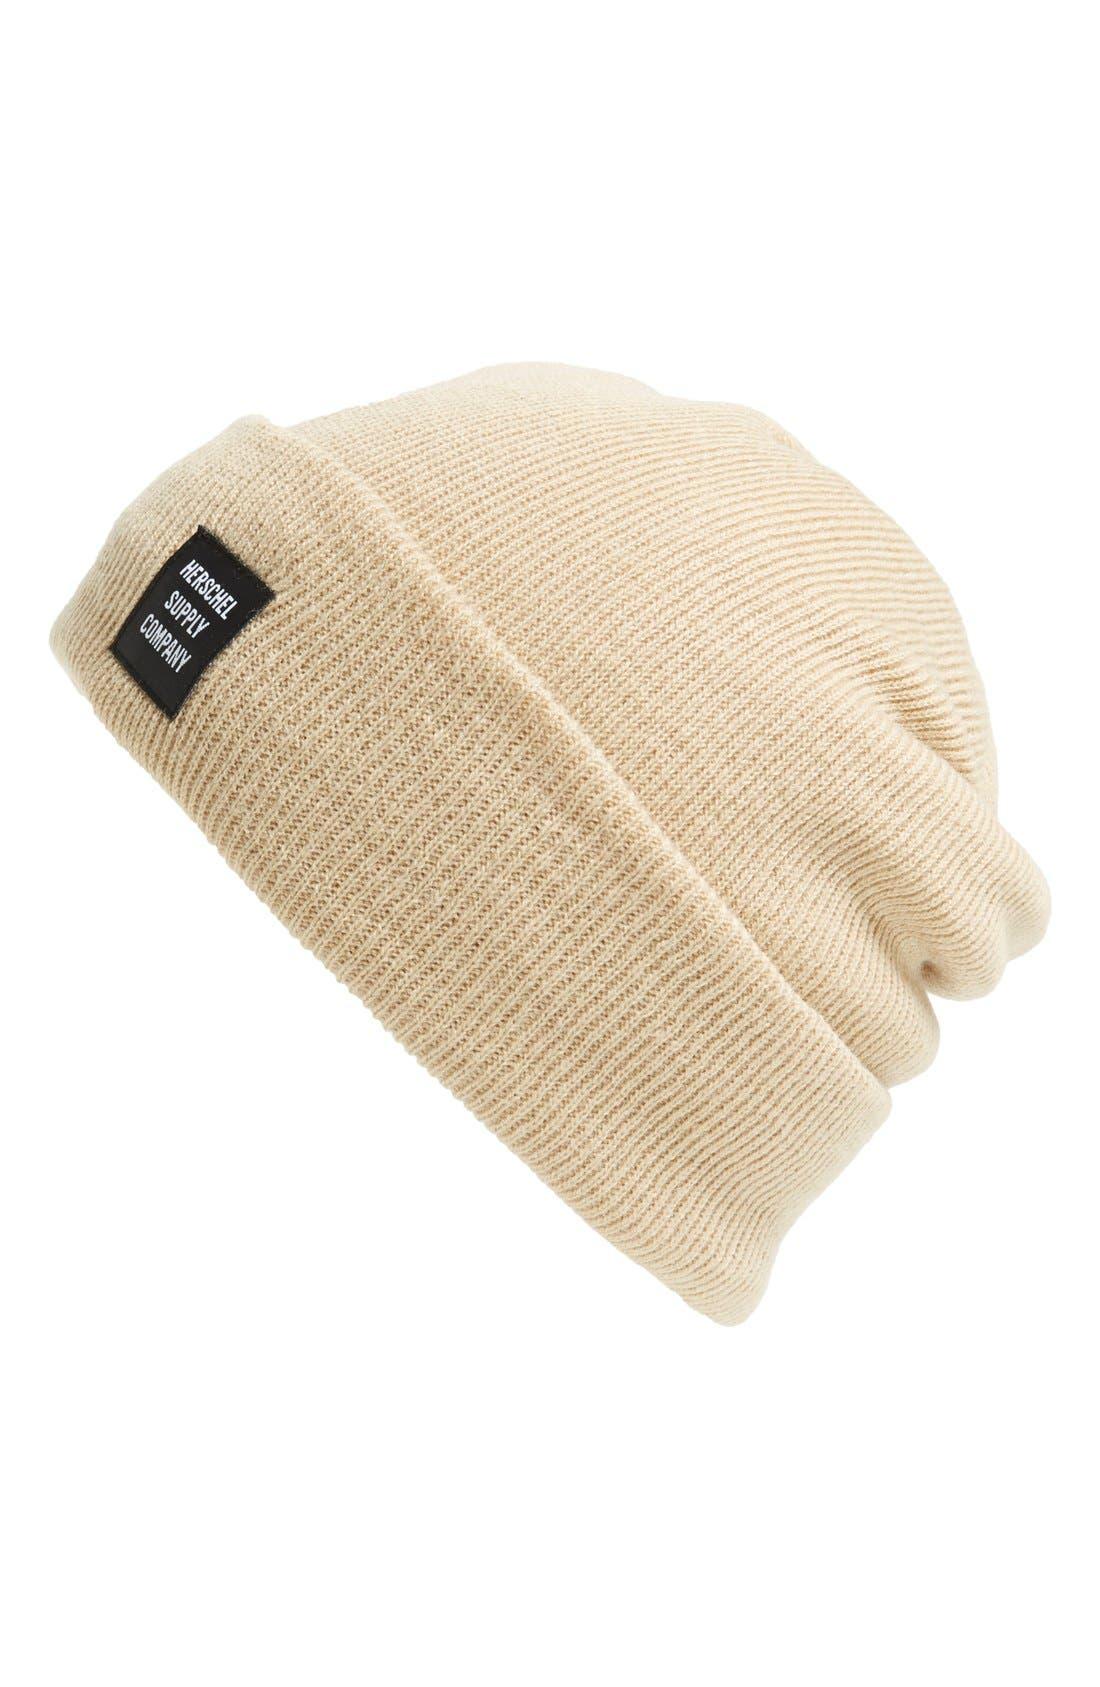 Main Image - Herschel Supply Co. 'Abbott' Knit Cap